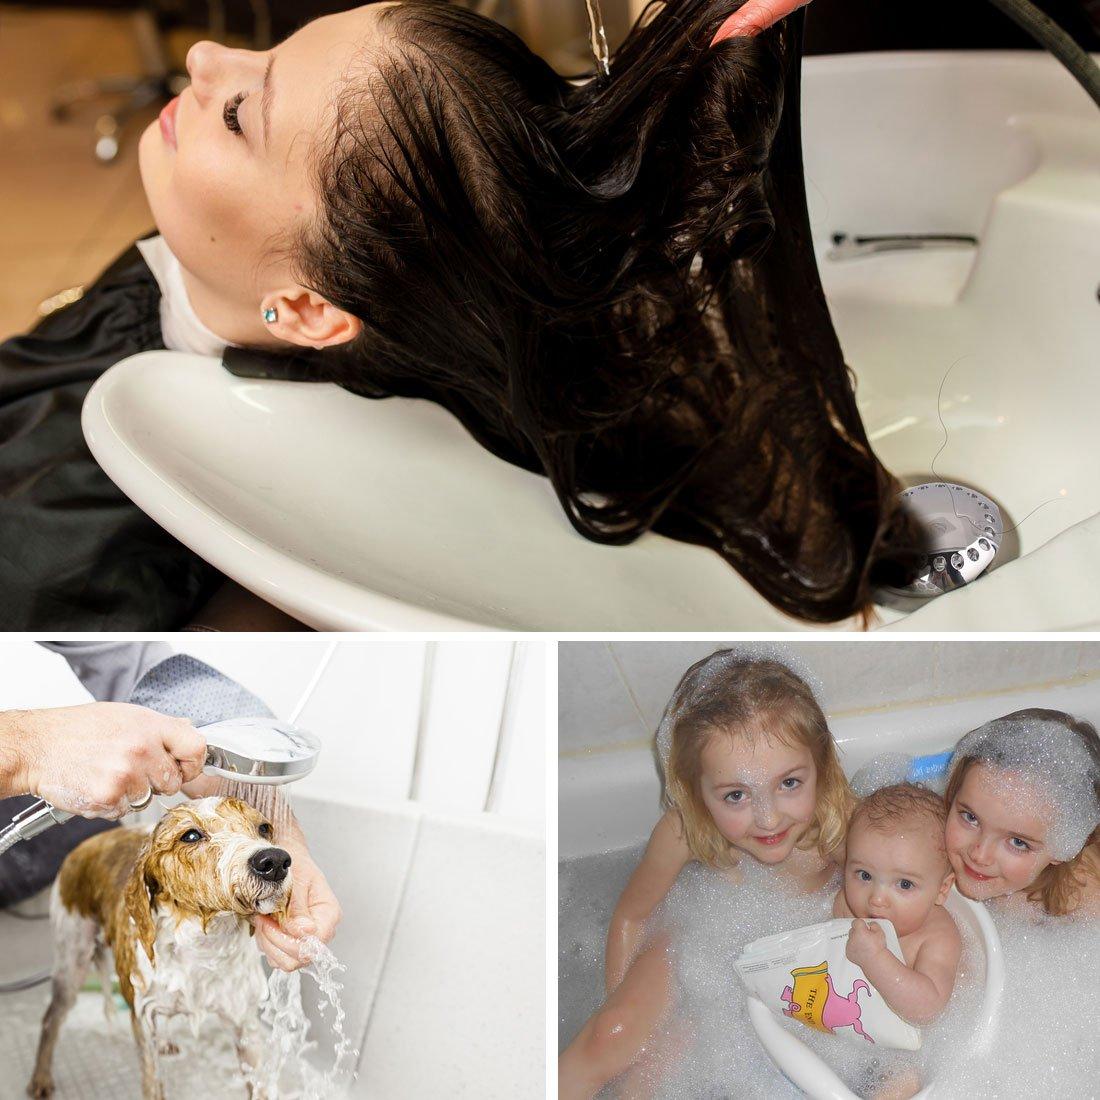 BABATH Tub Drain Hair Catcher Stainless Steel Bathtub Drain Protector Strainer